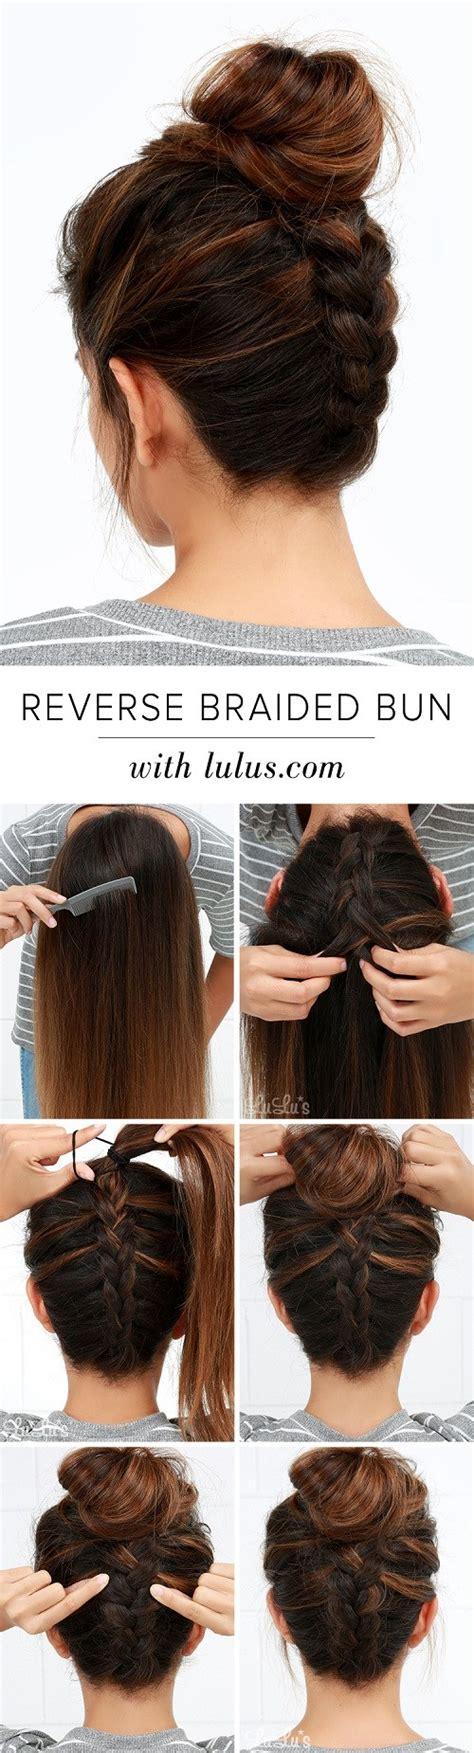 tutorial upside hairbun newbie 17 hair tutorials you can totally diy